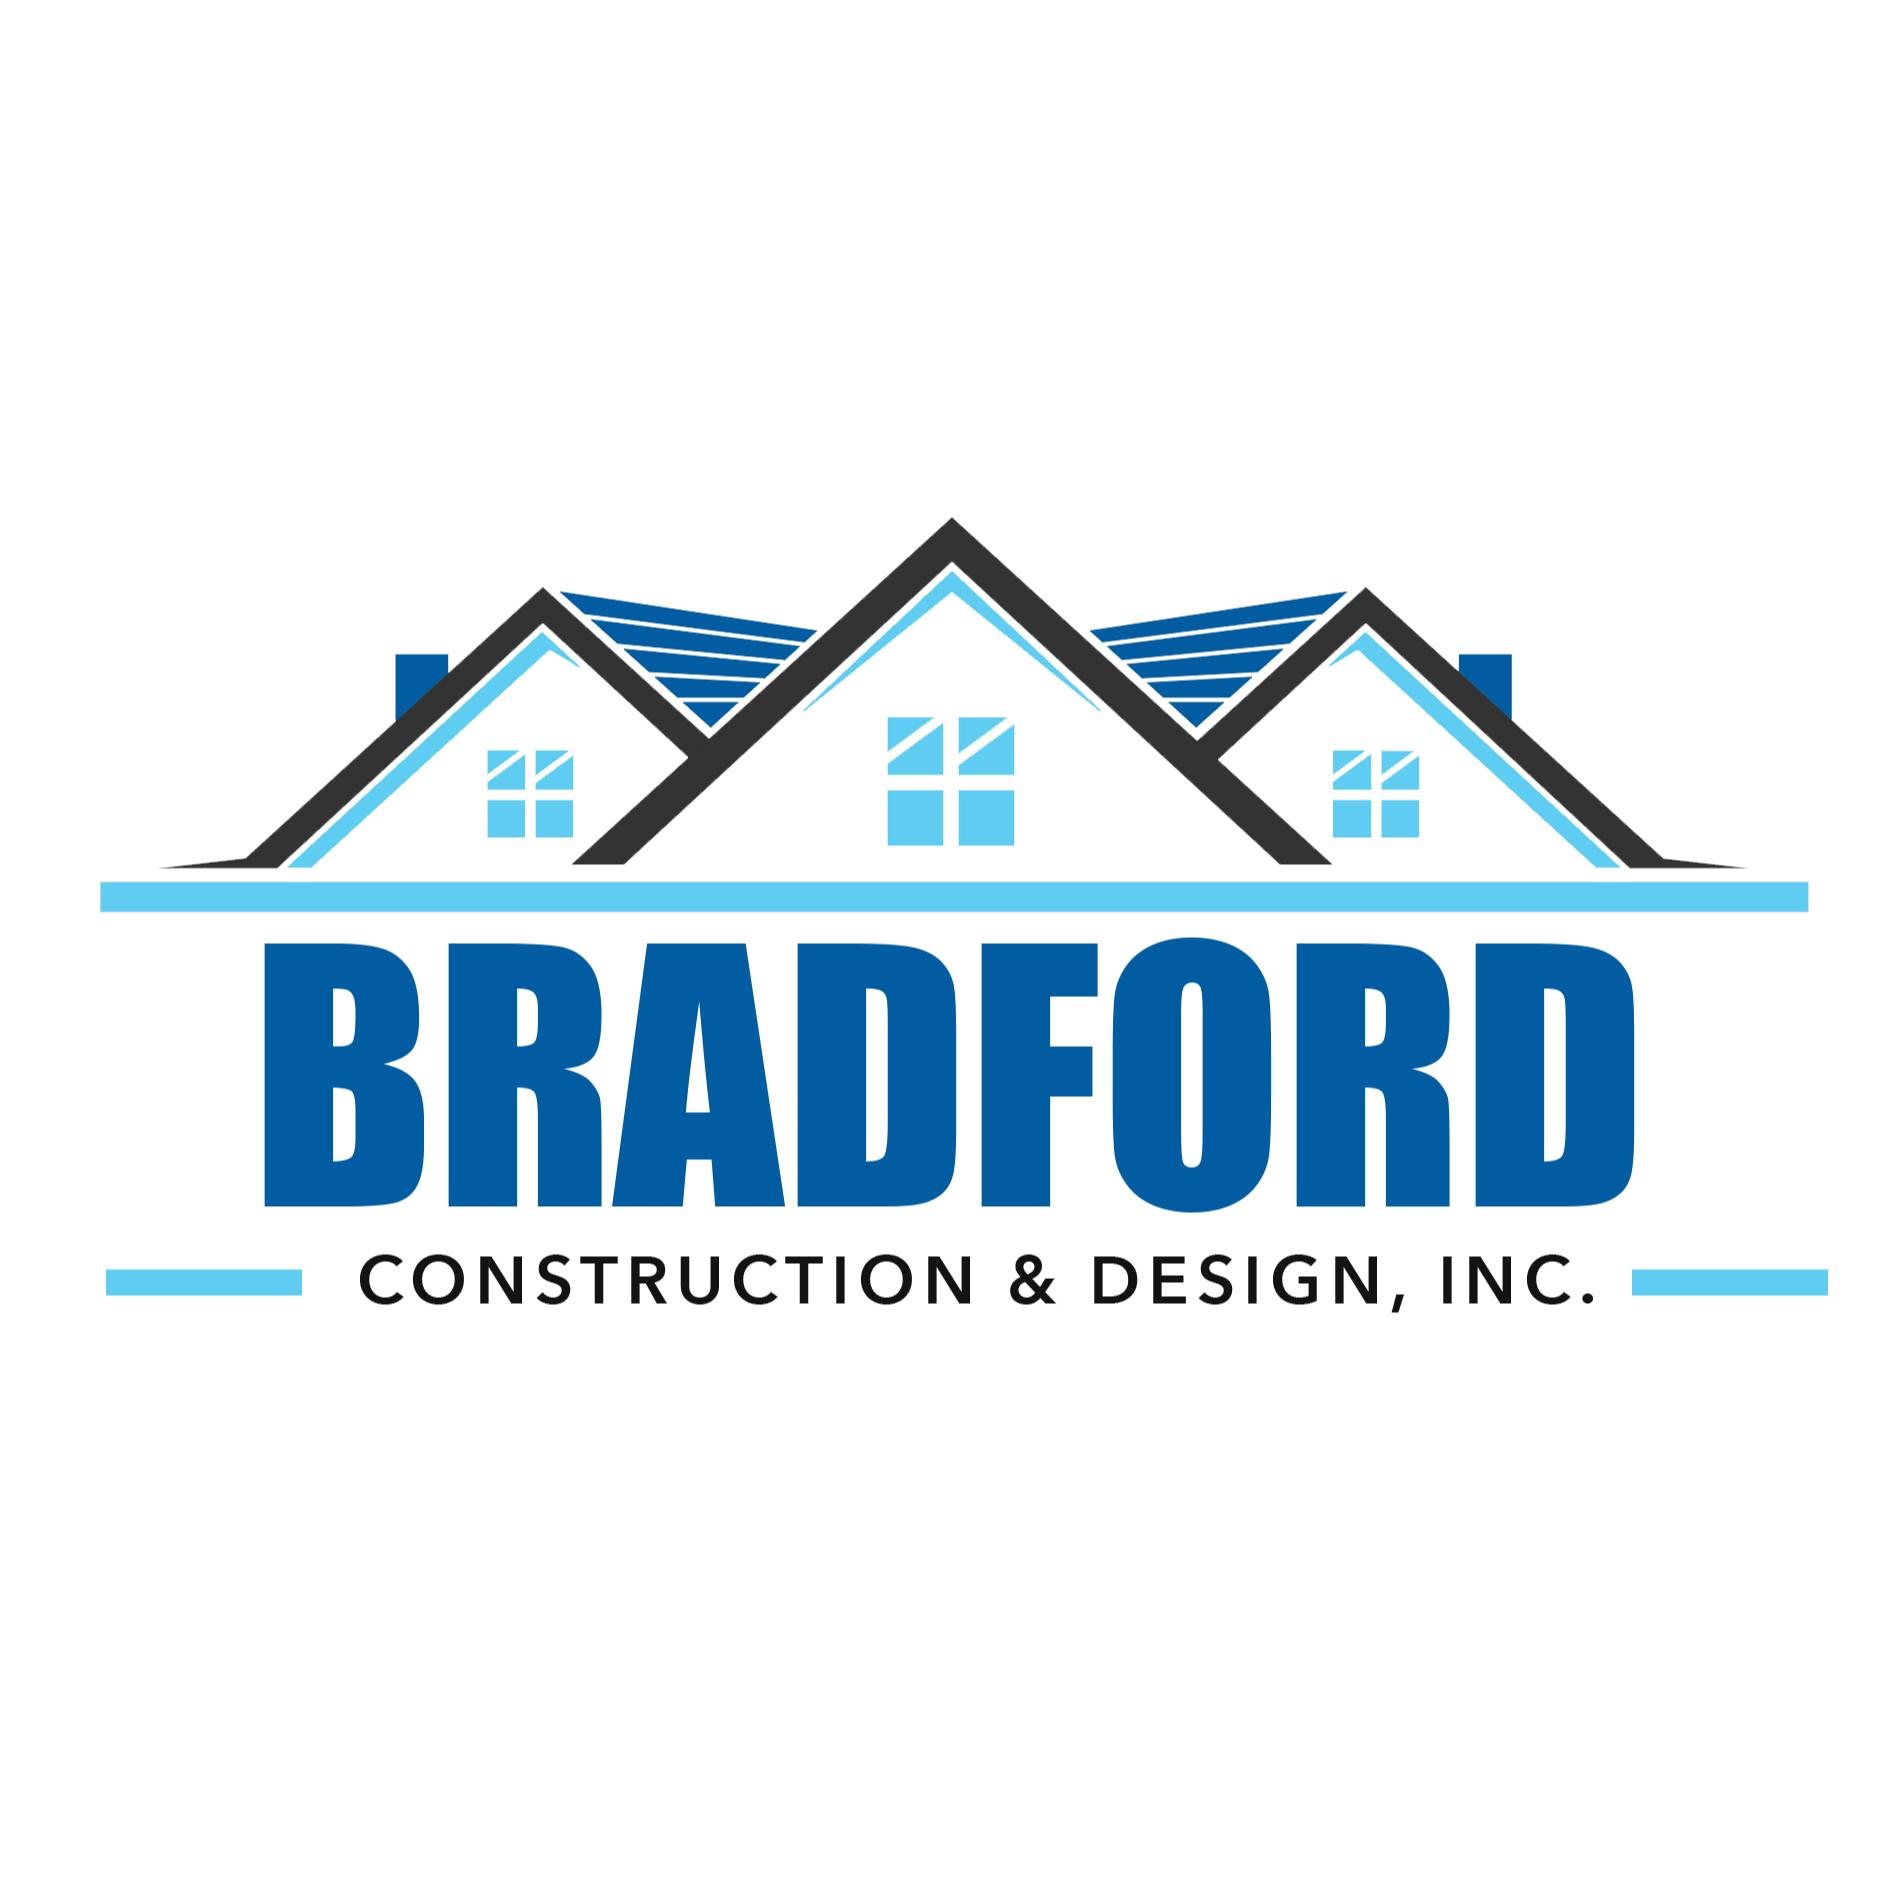 Bradford Construction & Design, Inc.